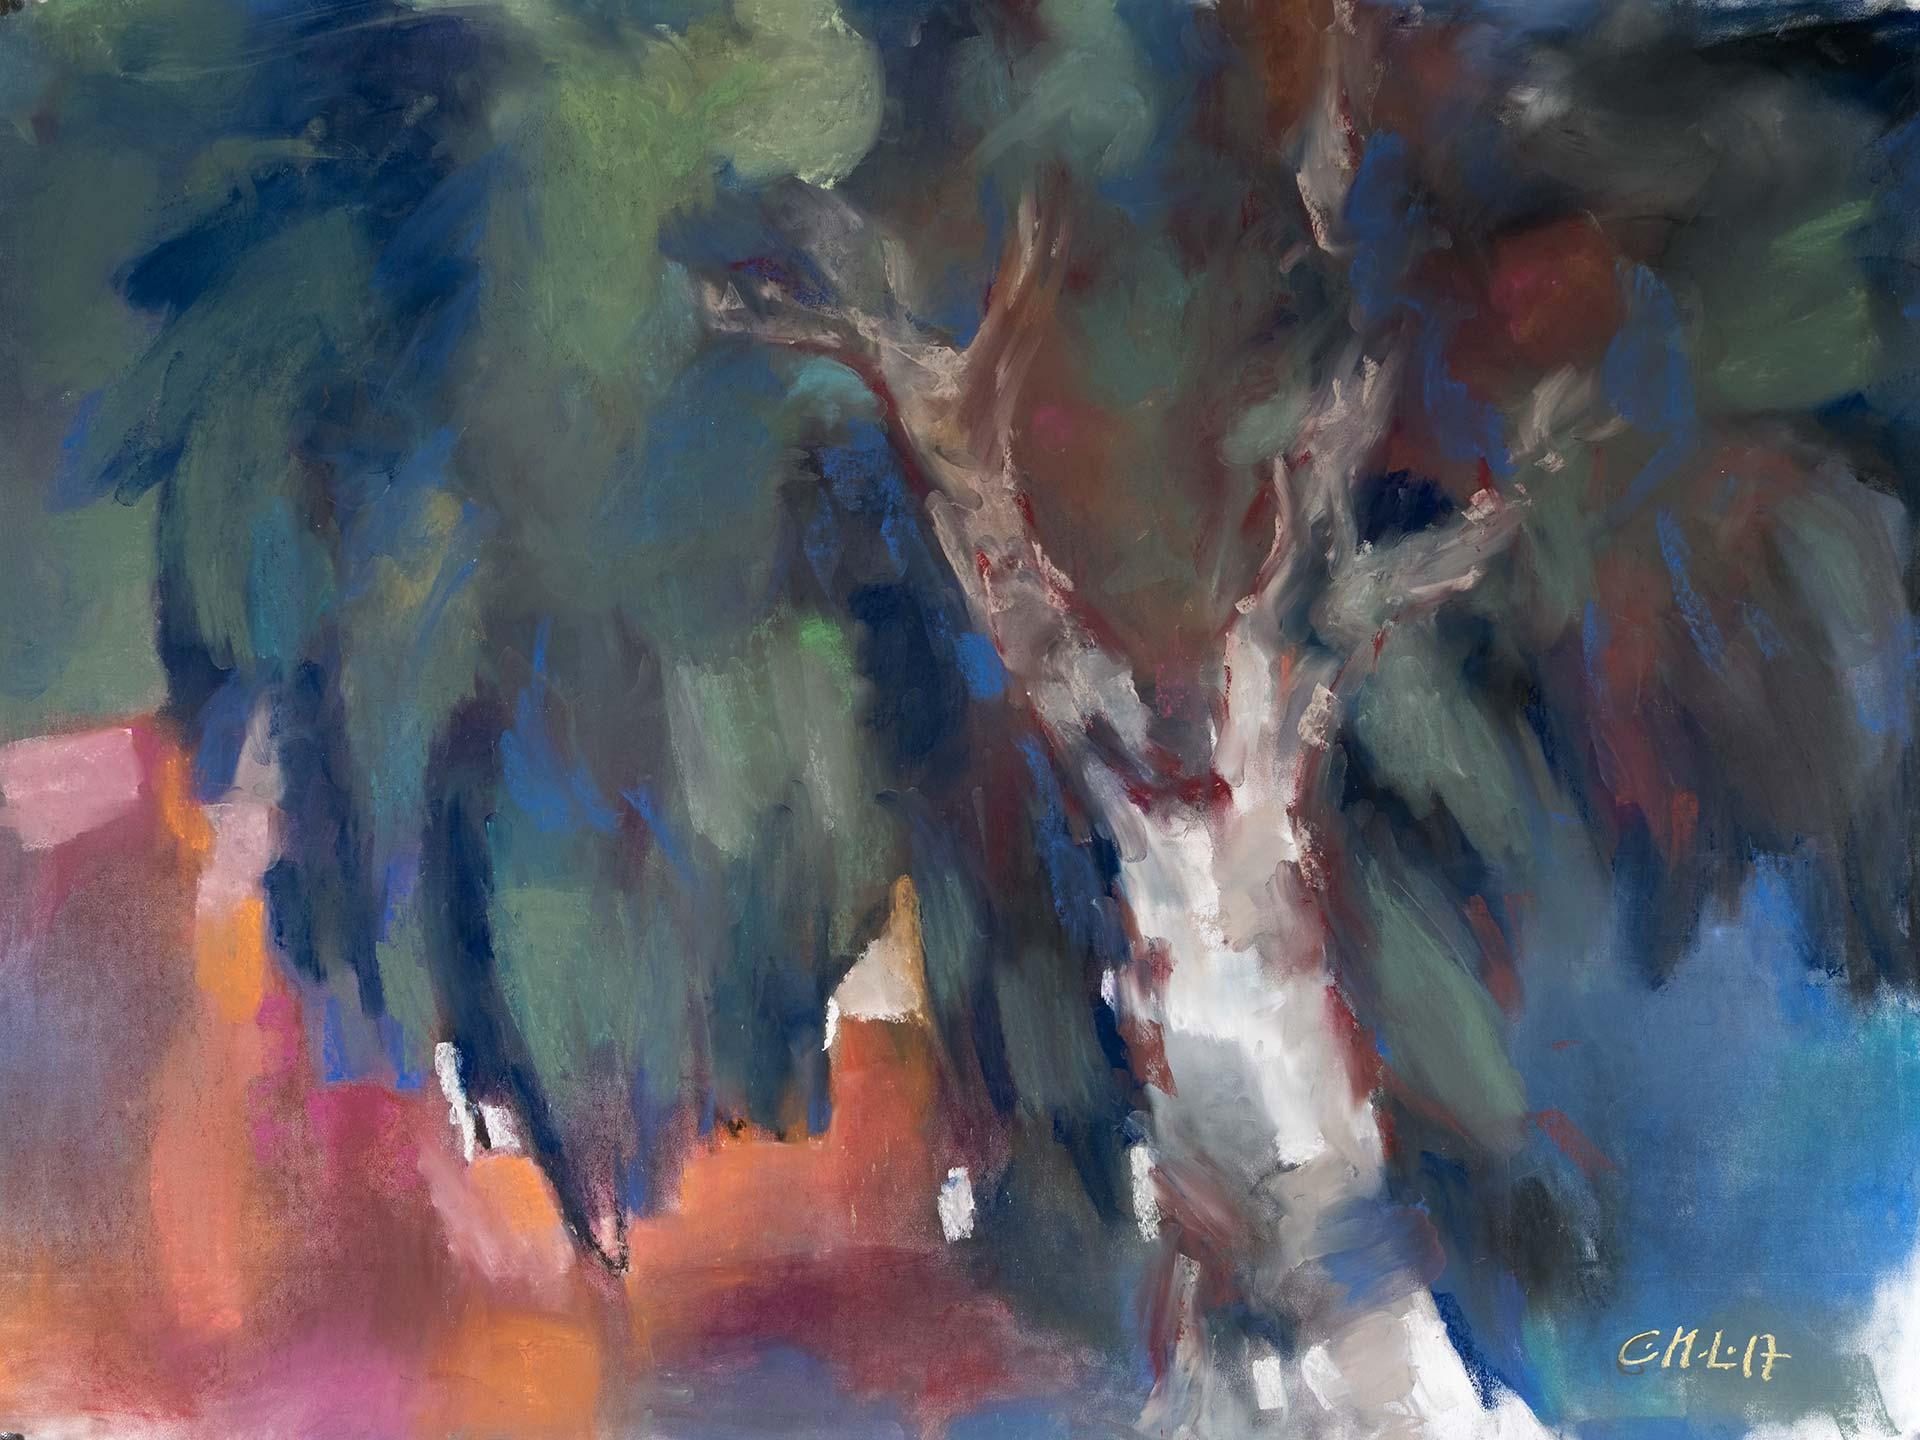 carmen-lins-09-2017-06-Der-dunkle-Baum-130x110cm